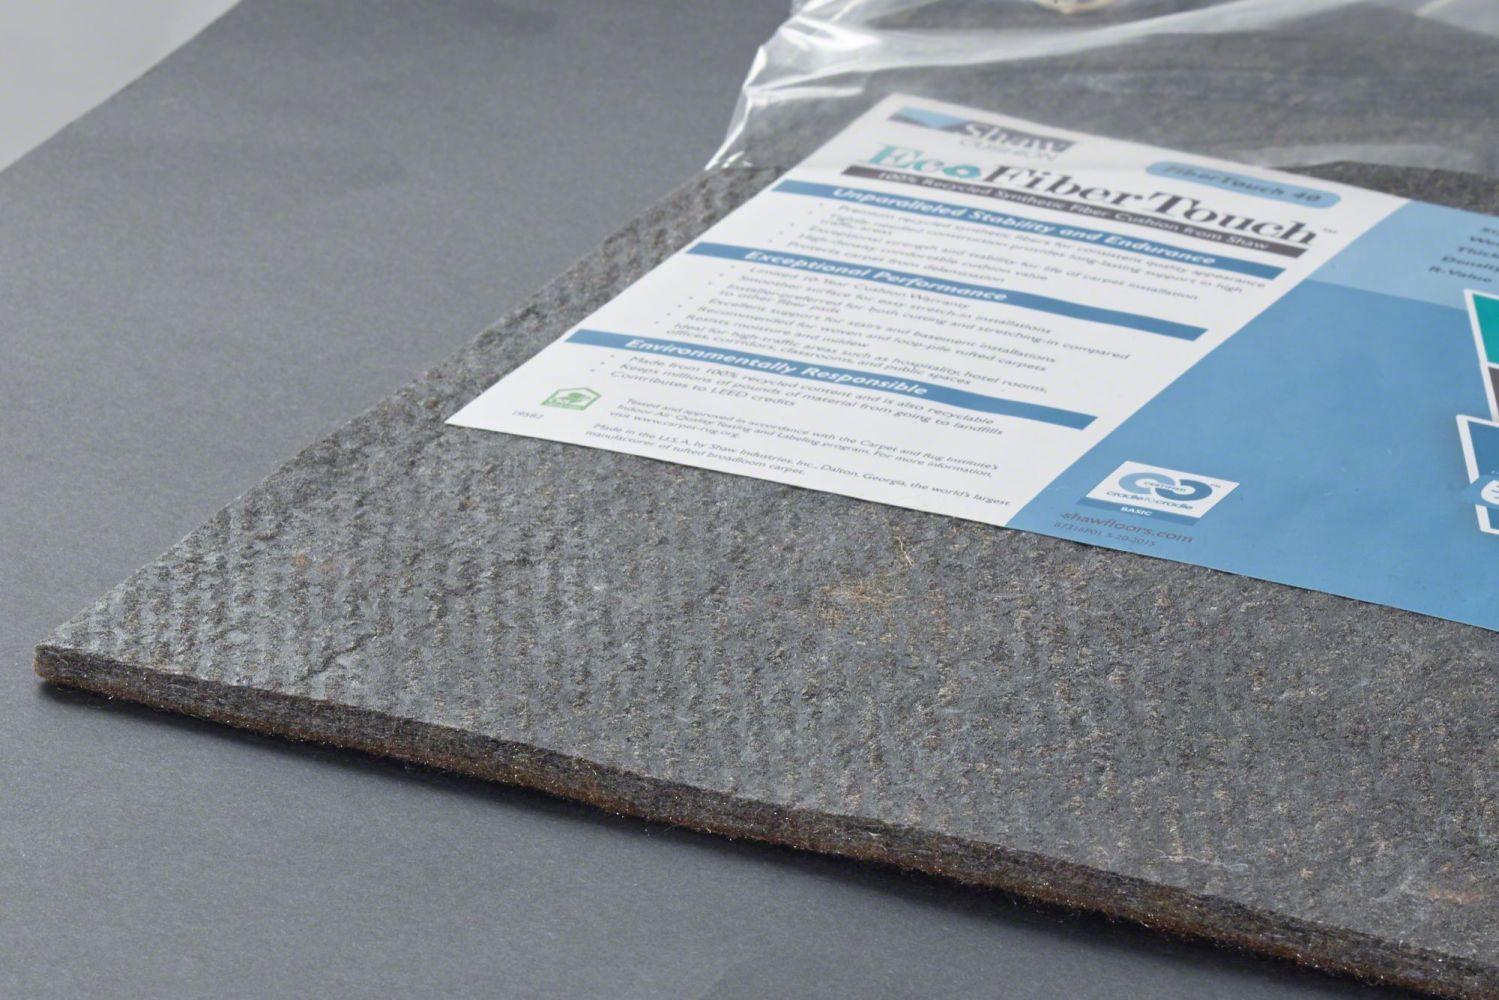 Shaw Floors Eco Edge Cushion Fibertouch 40-6 Grey 00001_440FT